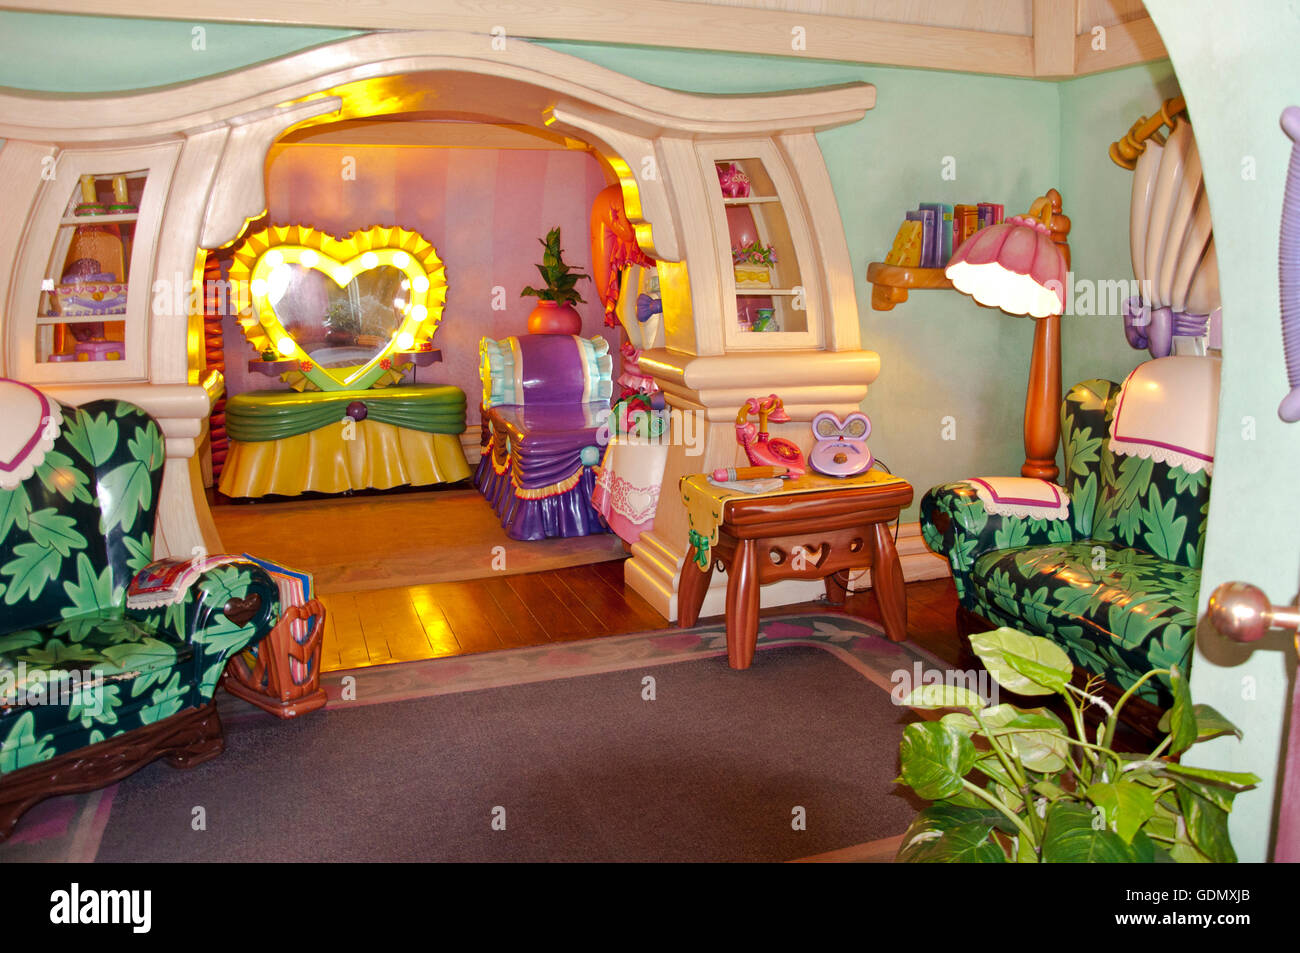 Mickey Mouse House In Disneyland Amusement Park, California.